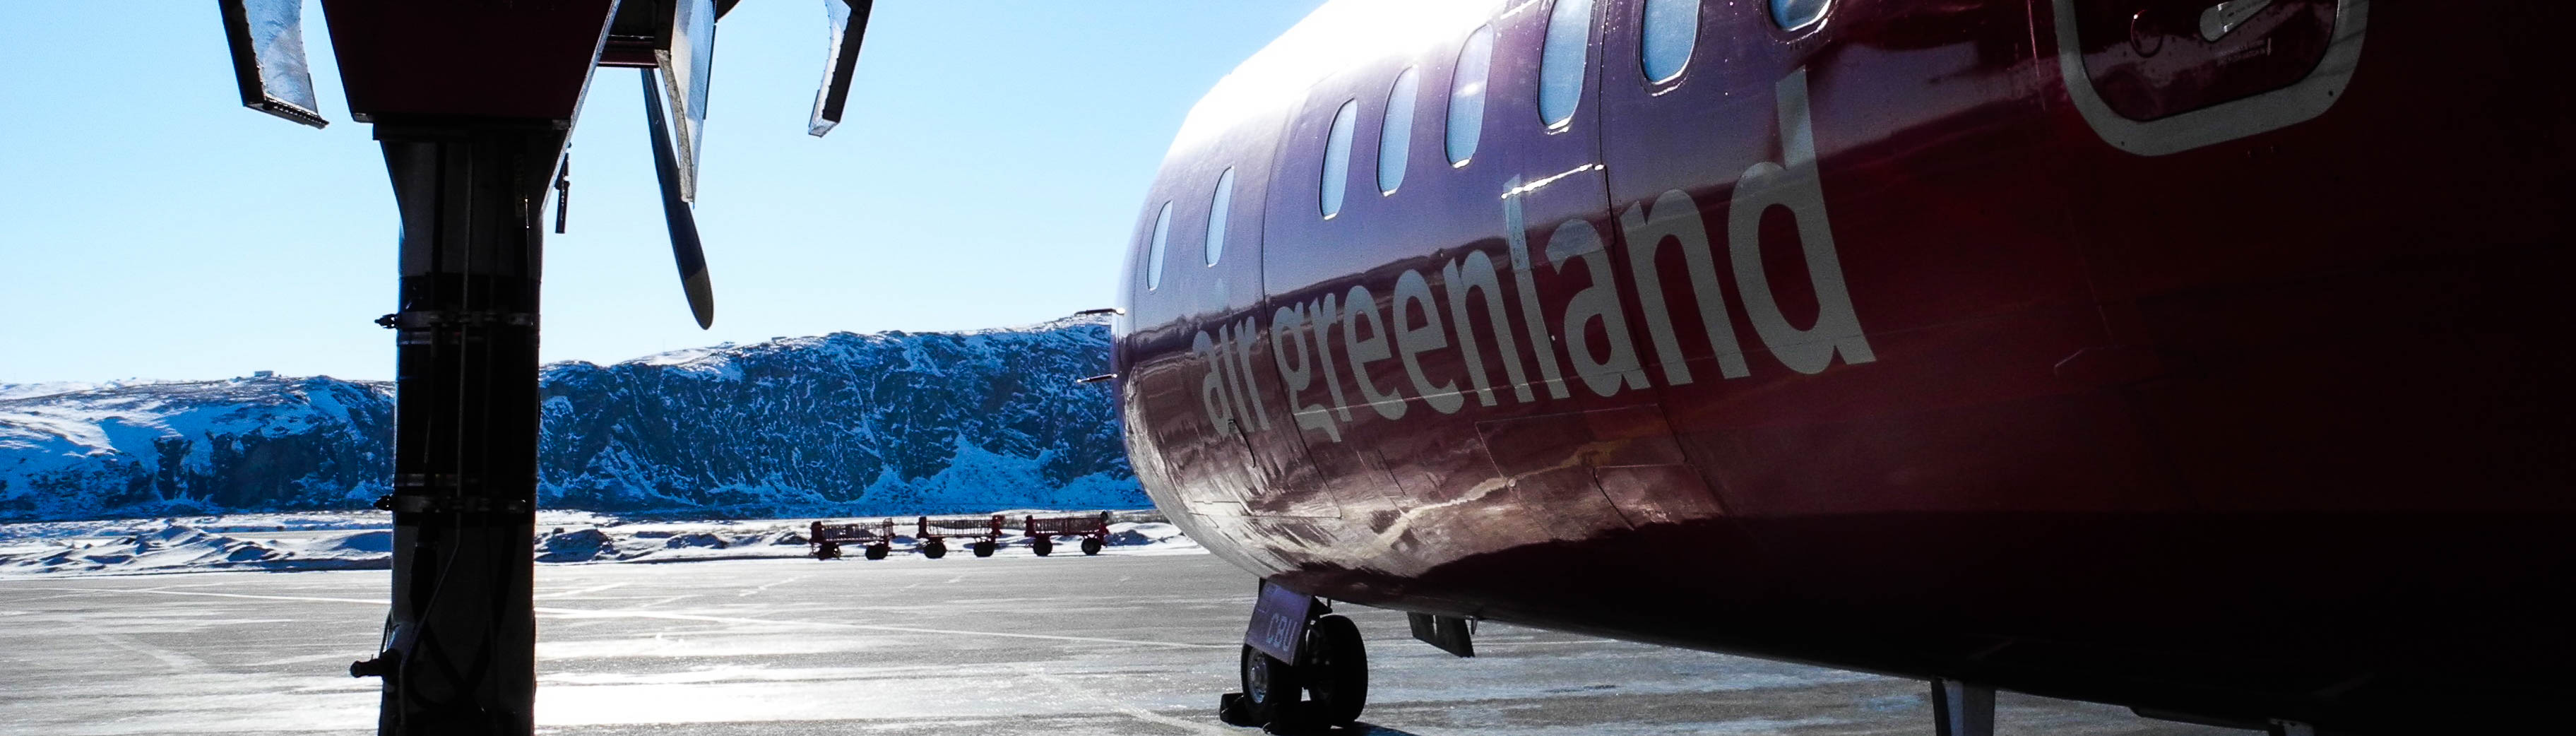 Skitouren Grönland, Grönland Ski